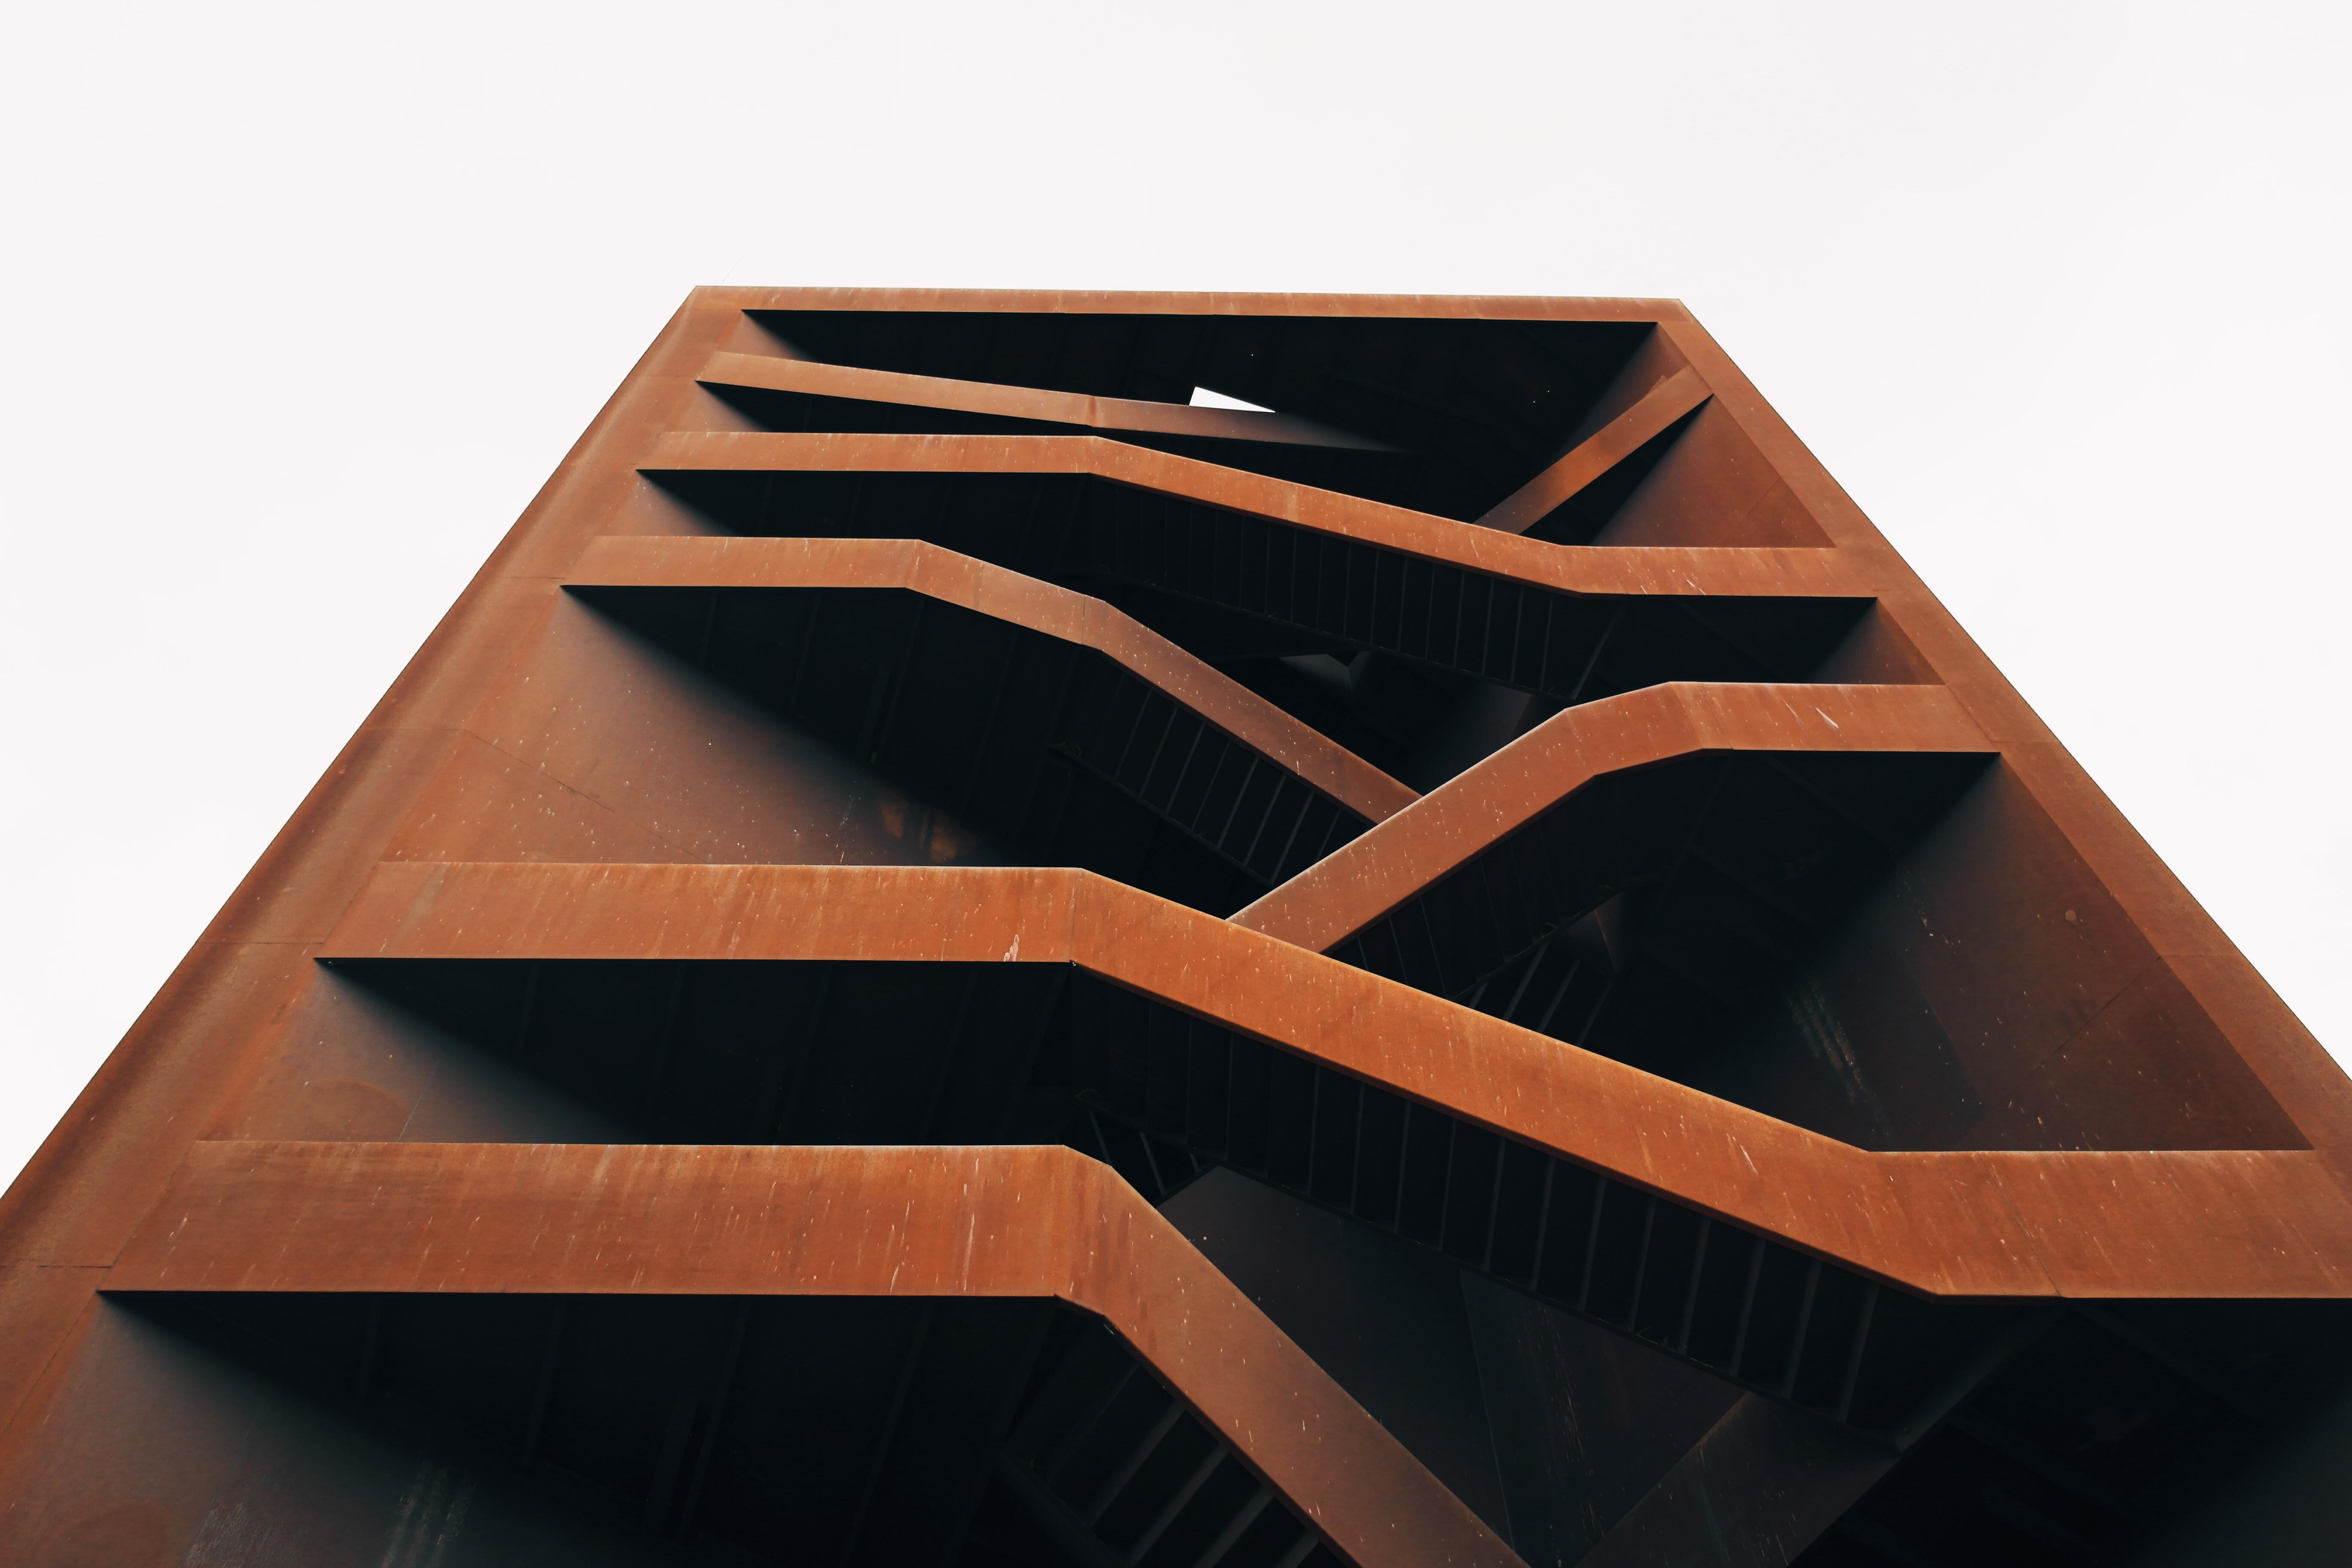 rectangular brown wooden board